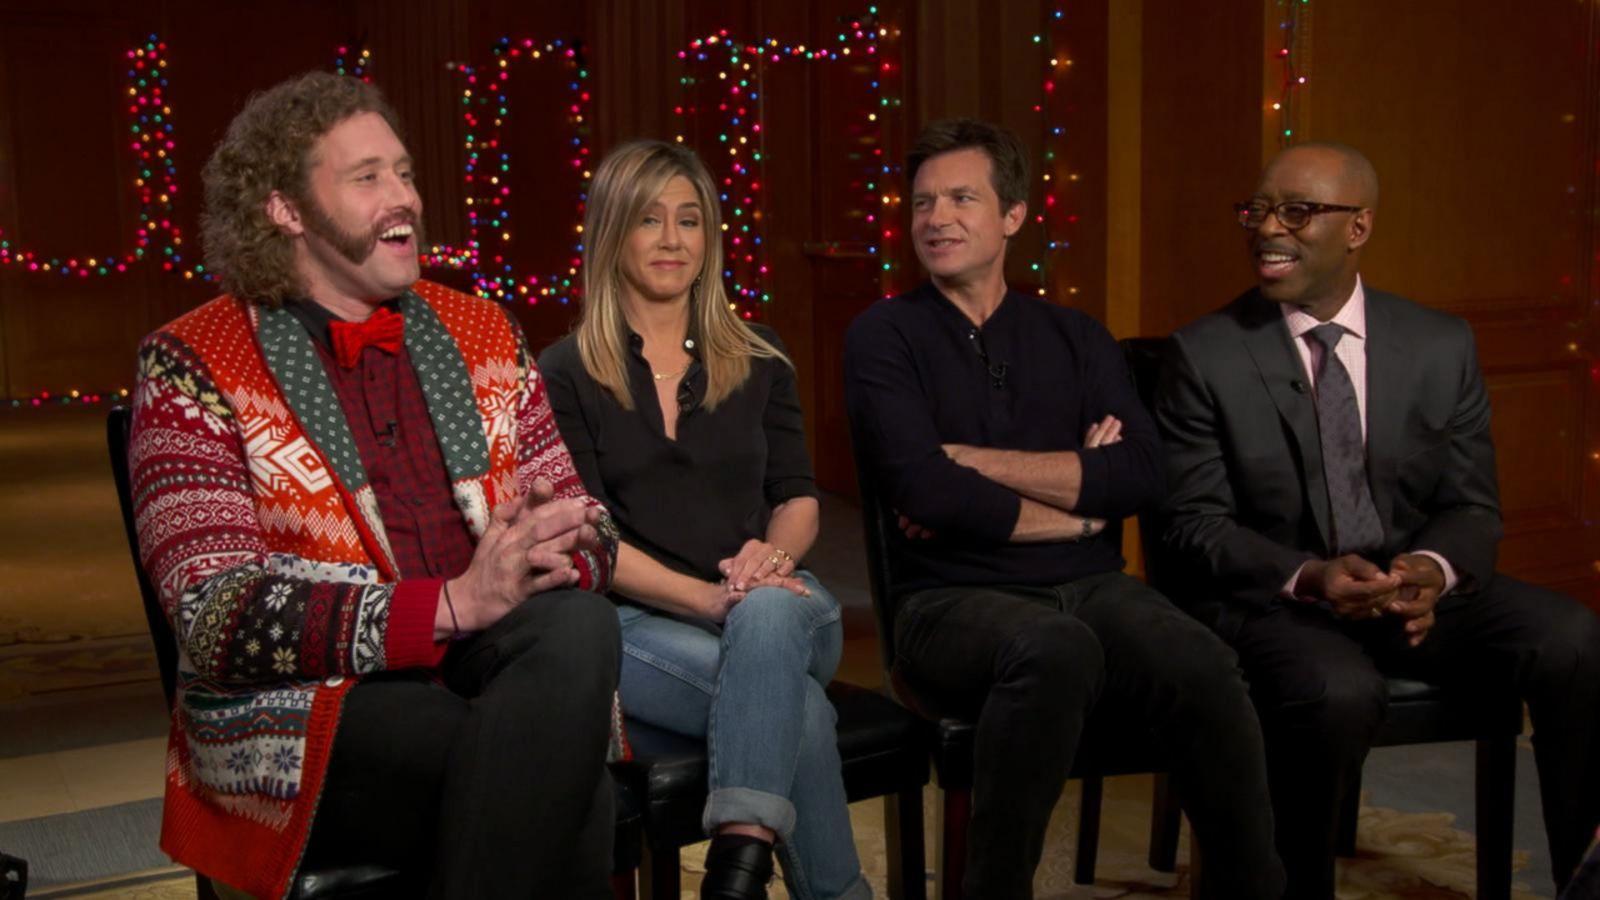 VIDEO: Jennifer Aniston, Jason Bateman, and More Discuss 'Office Christmas Party'